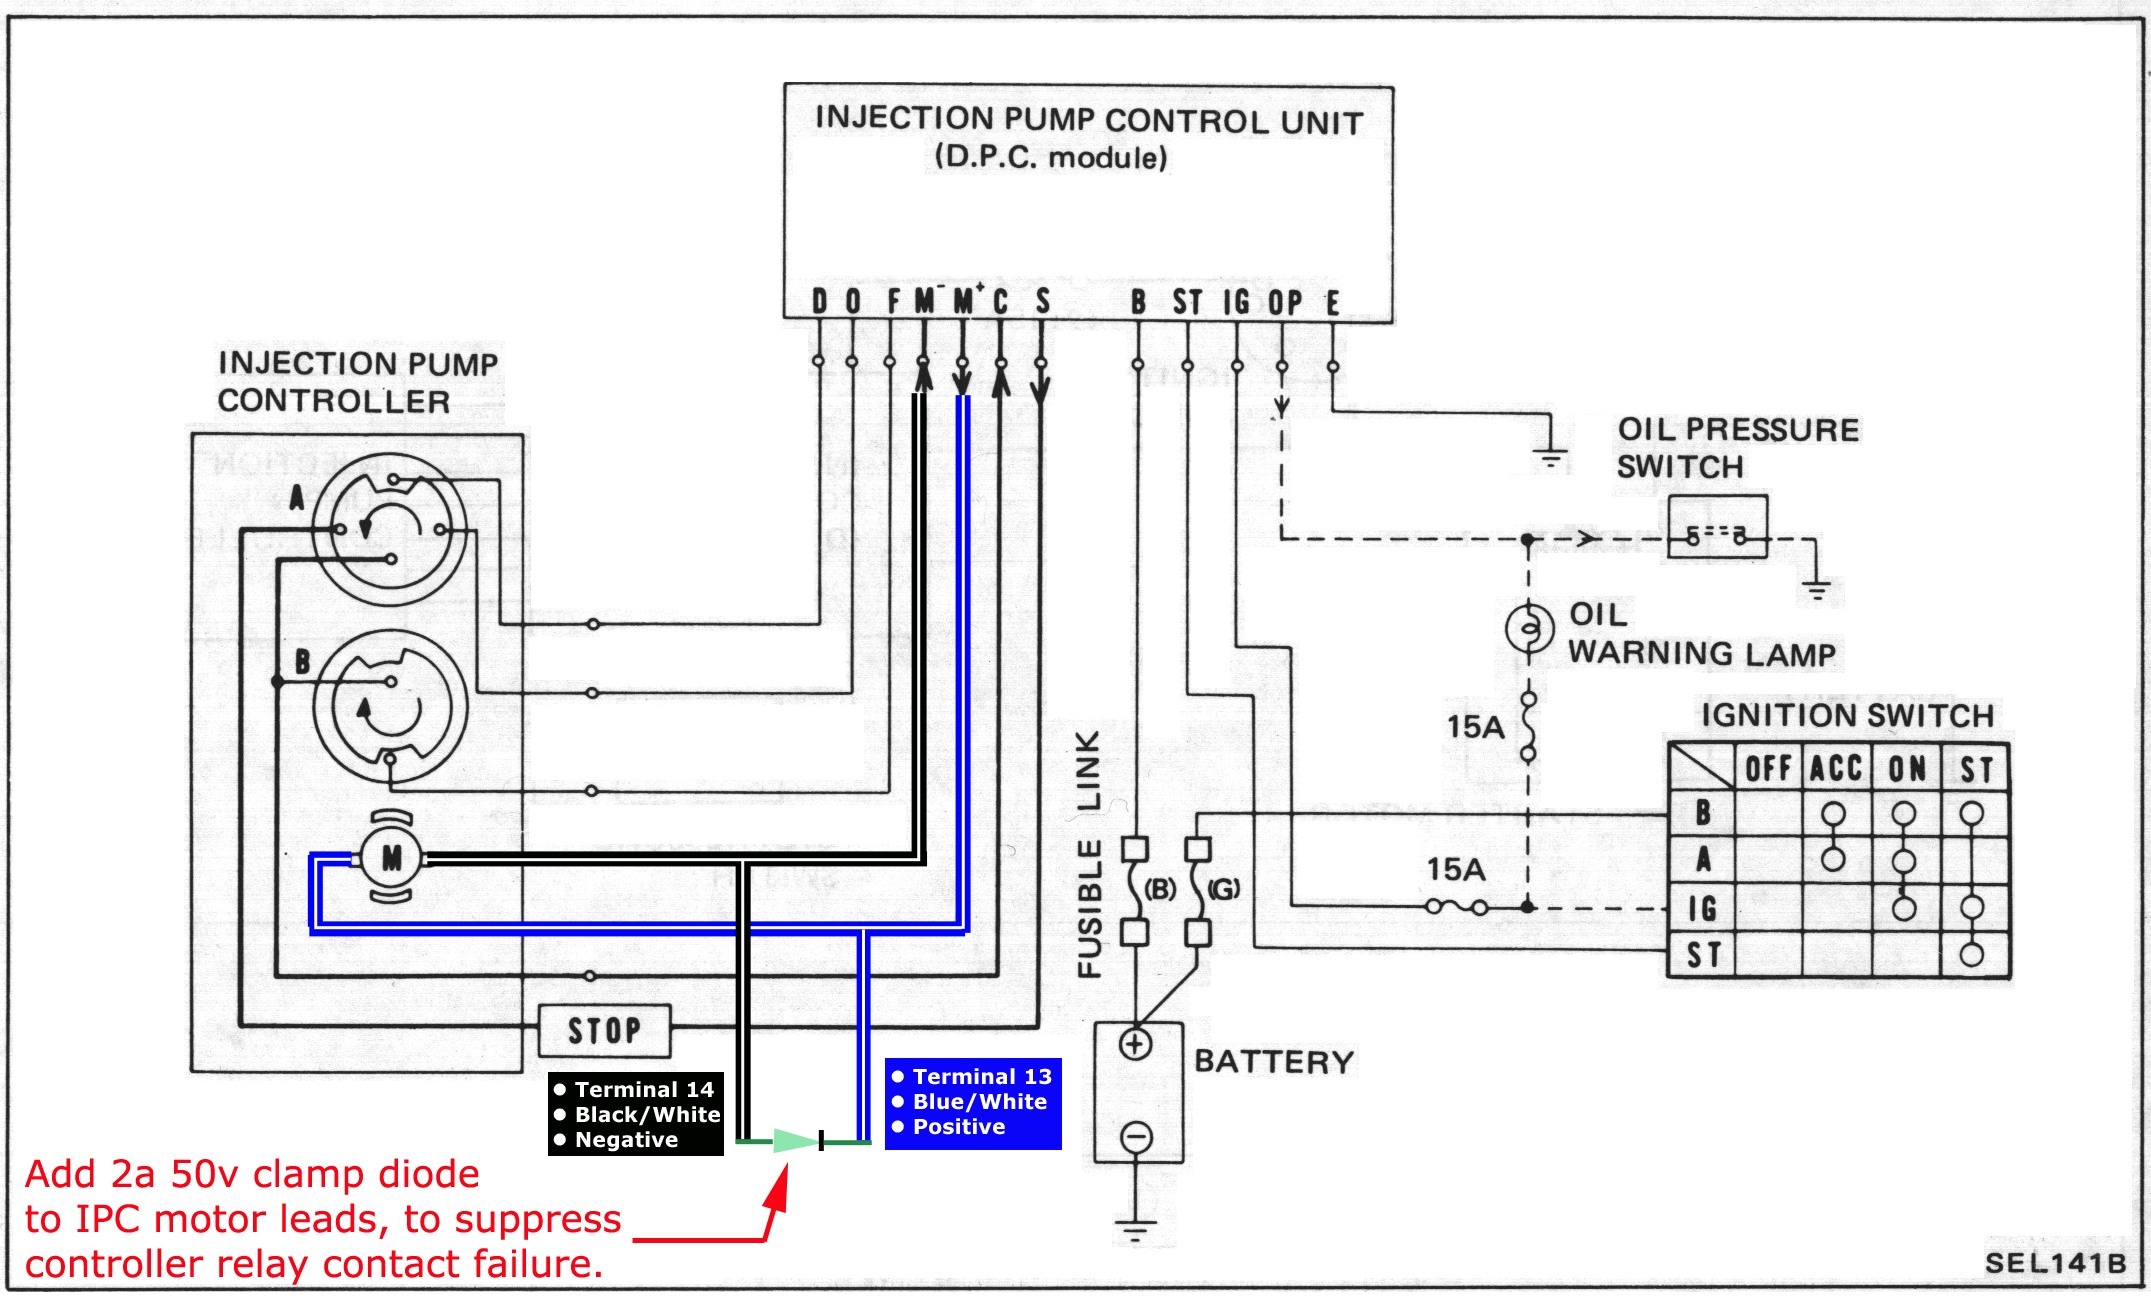 FSM_1982_EL 047_1_b?resize\=665%2C403 300zx wiring diagram & wiring 1985 300zx ecu wiring diagram 1986 nissan 300zx wiring harness at eliteediting.co